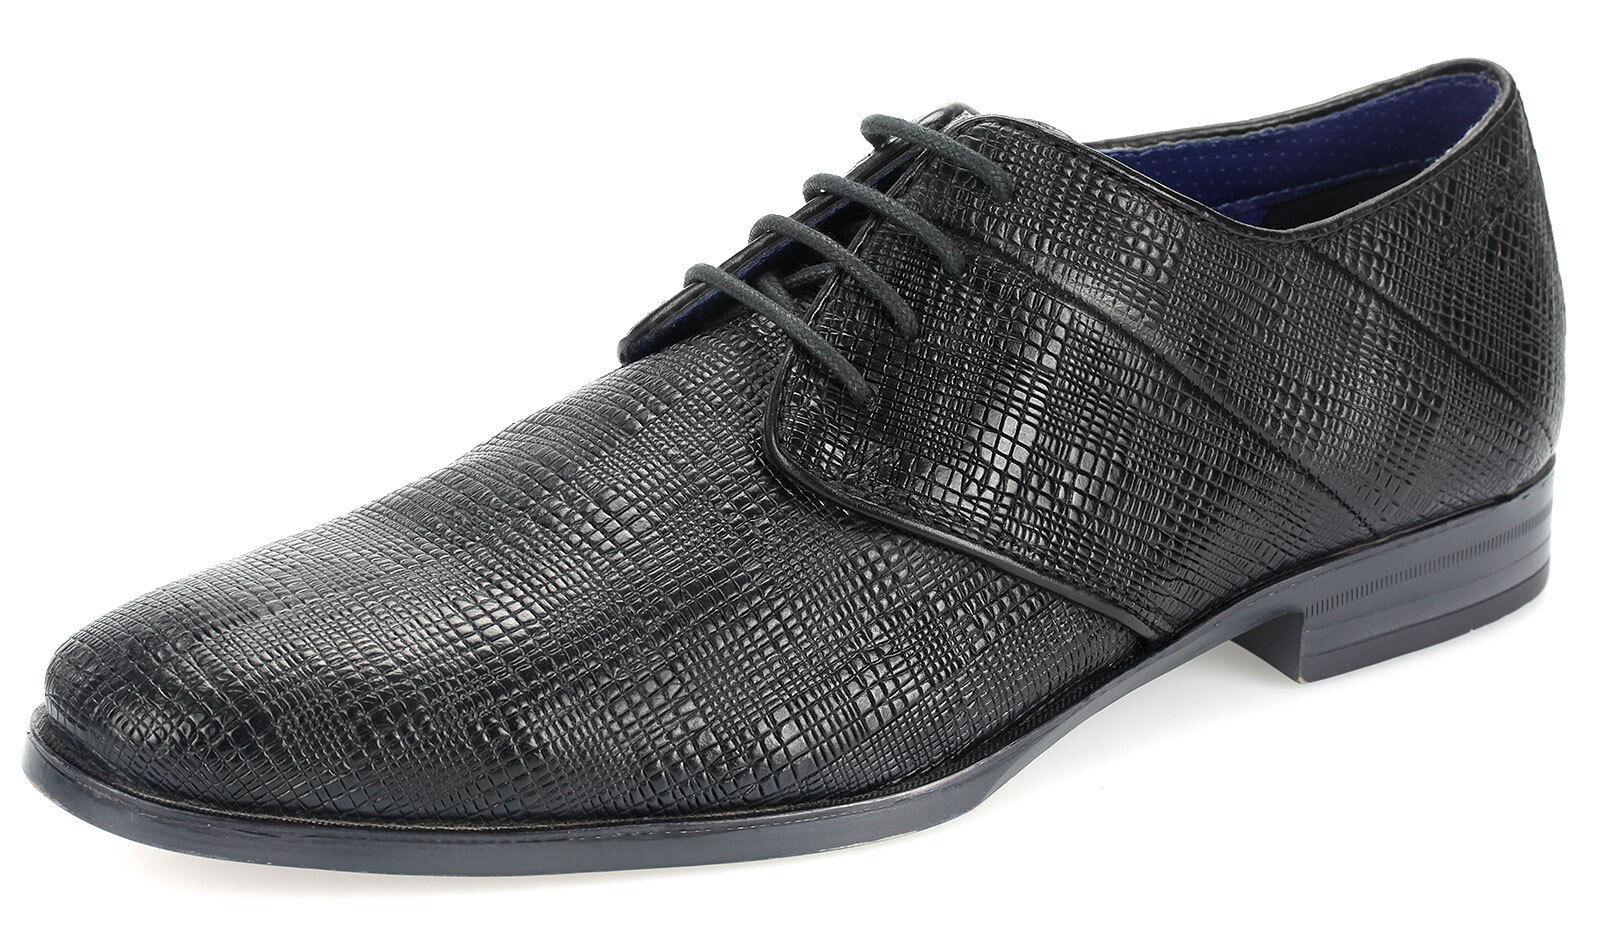 Bugatti Business-Schuhe Herren Leder Halbschuhe Schnürschuhe 44605 Schwarz